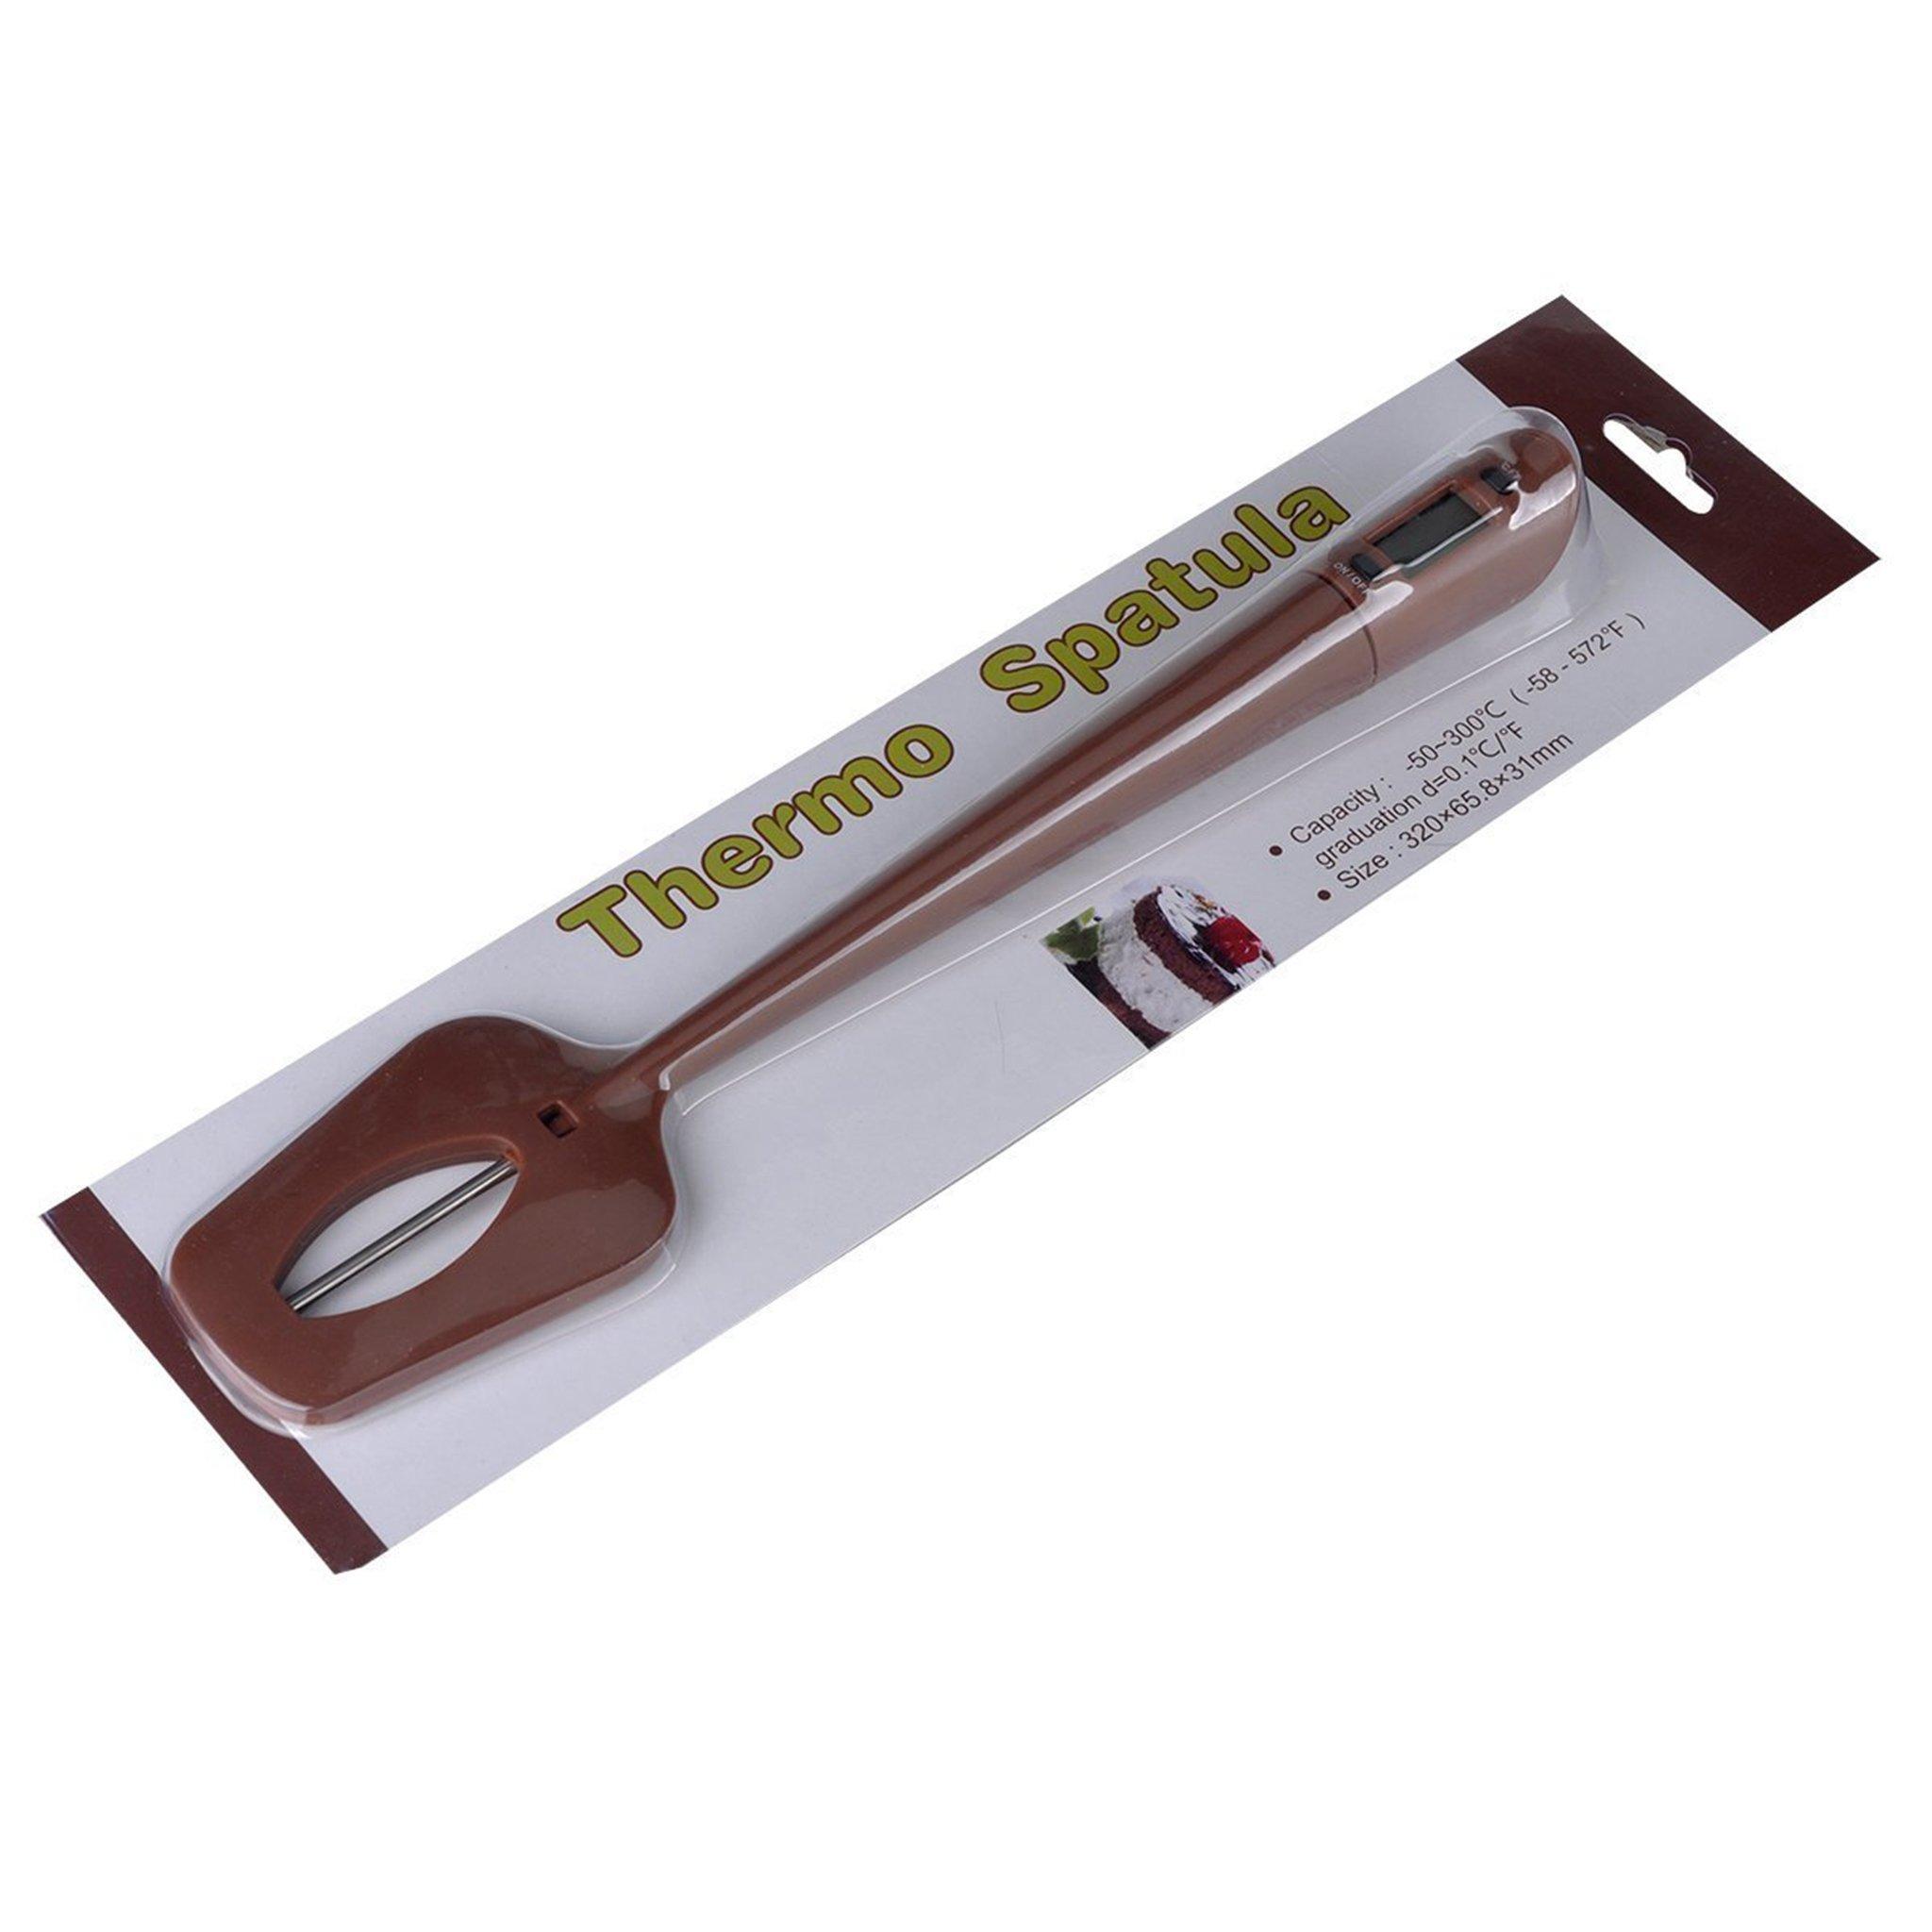 JIAYE Food Grade Silicone/Nylon Spatula Digital Thermometer Scraper for Chocolate Jams Food Cooking Baking BBQ by JIAYE INC (Image #5)